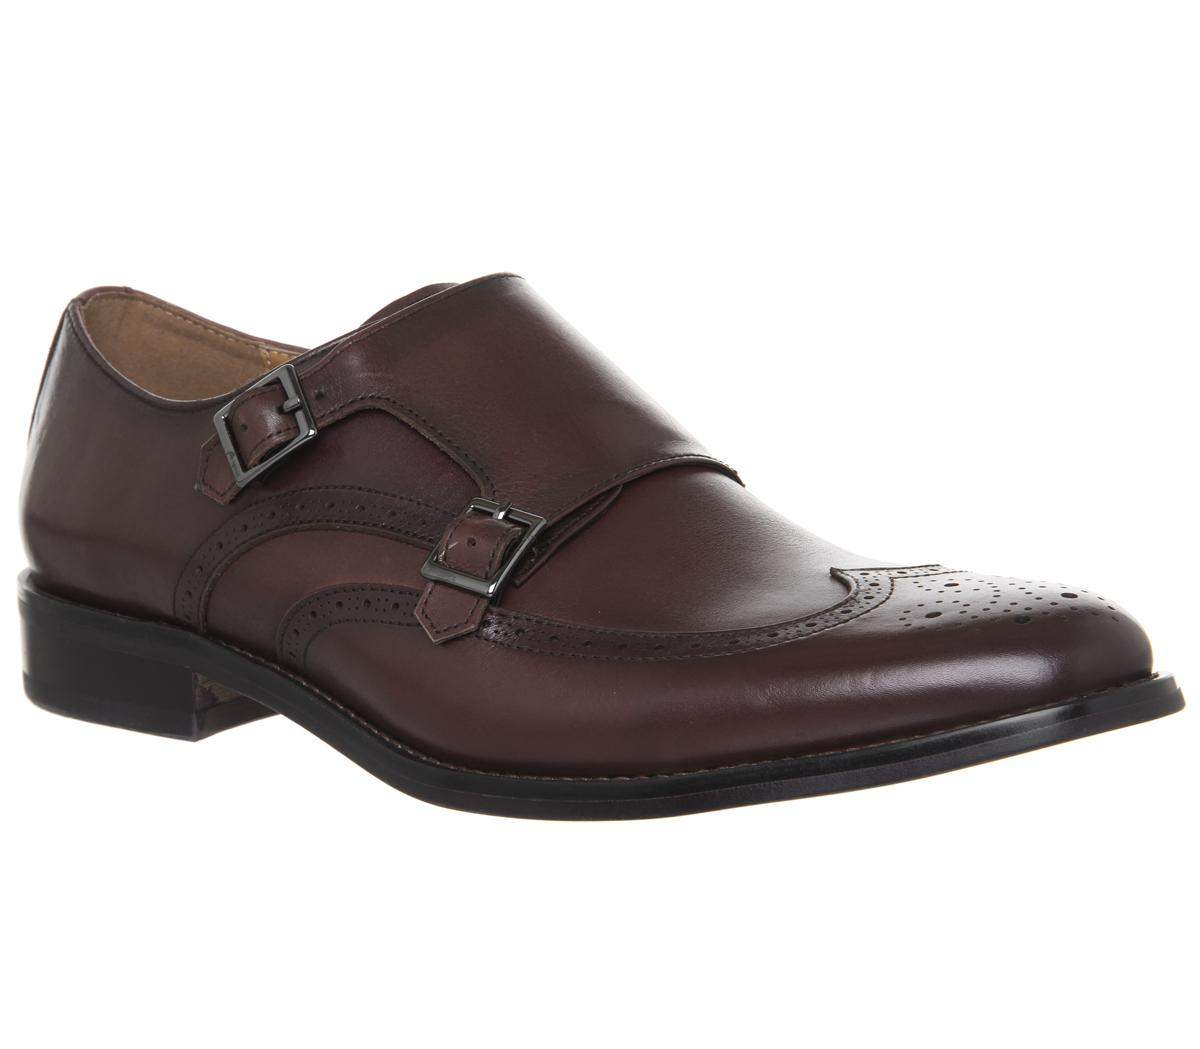 Import Brogue Monk Shoes